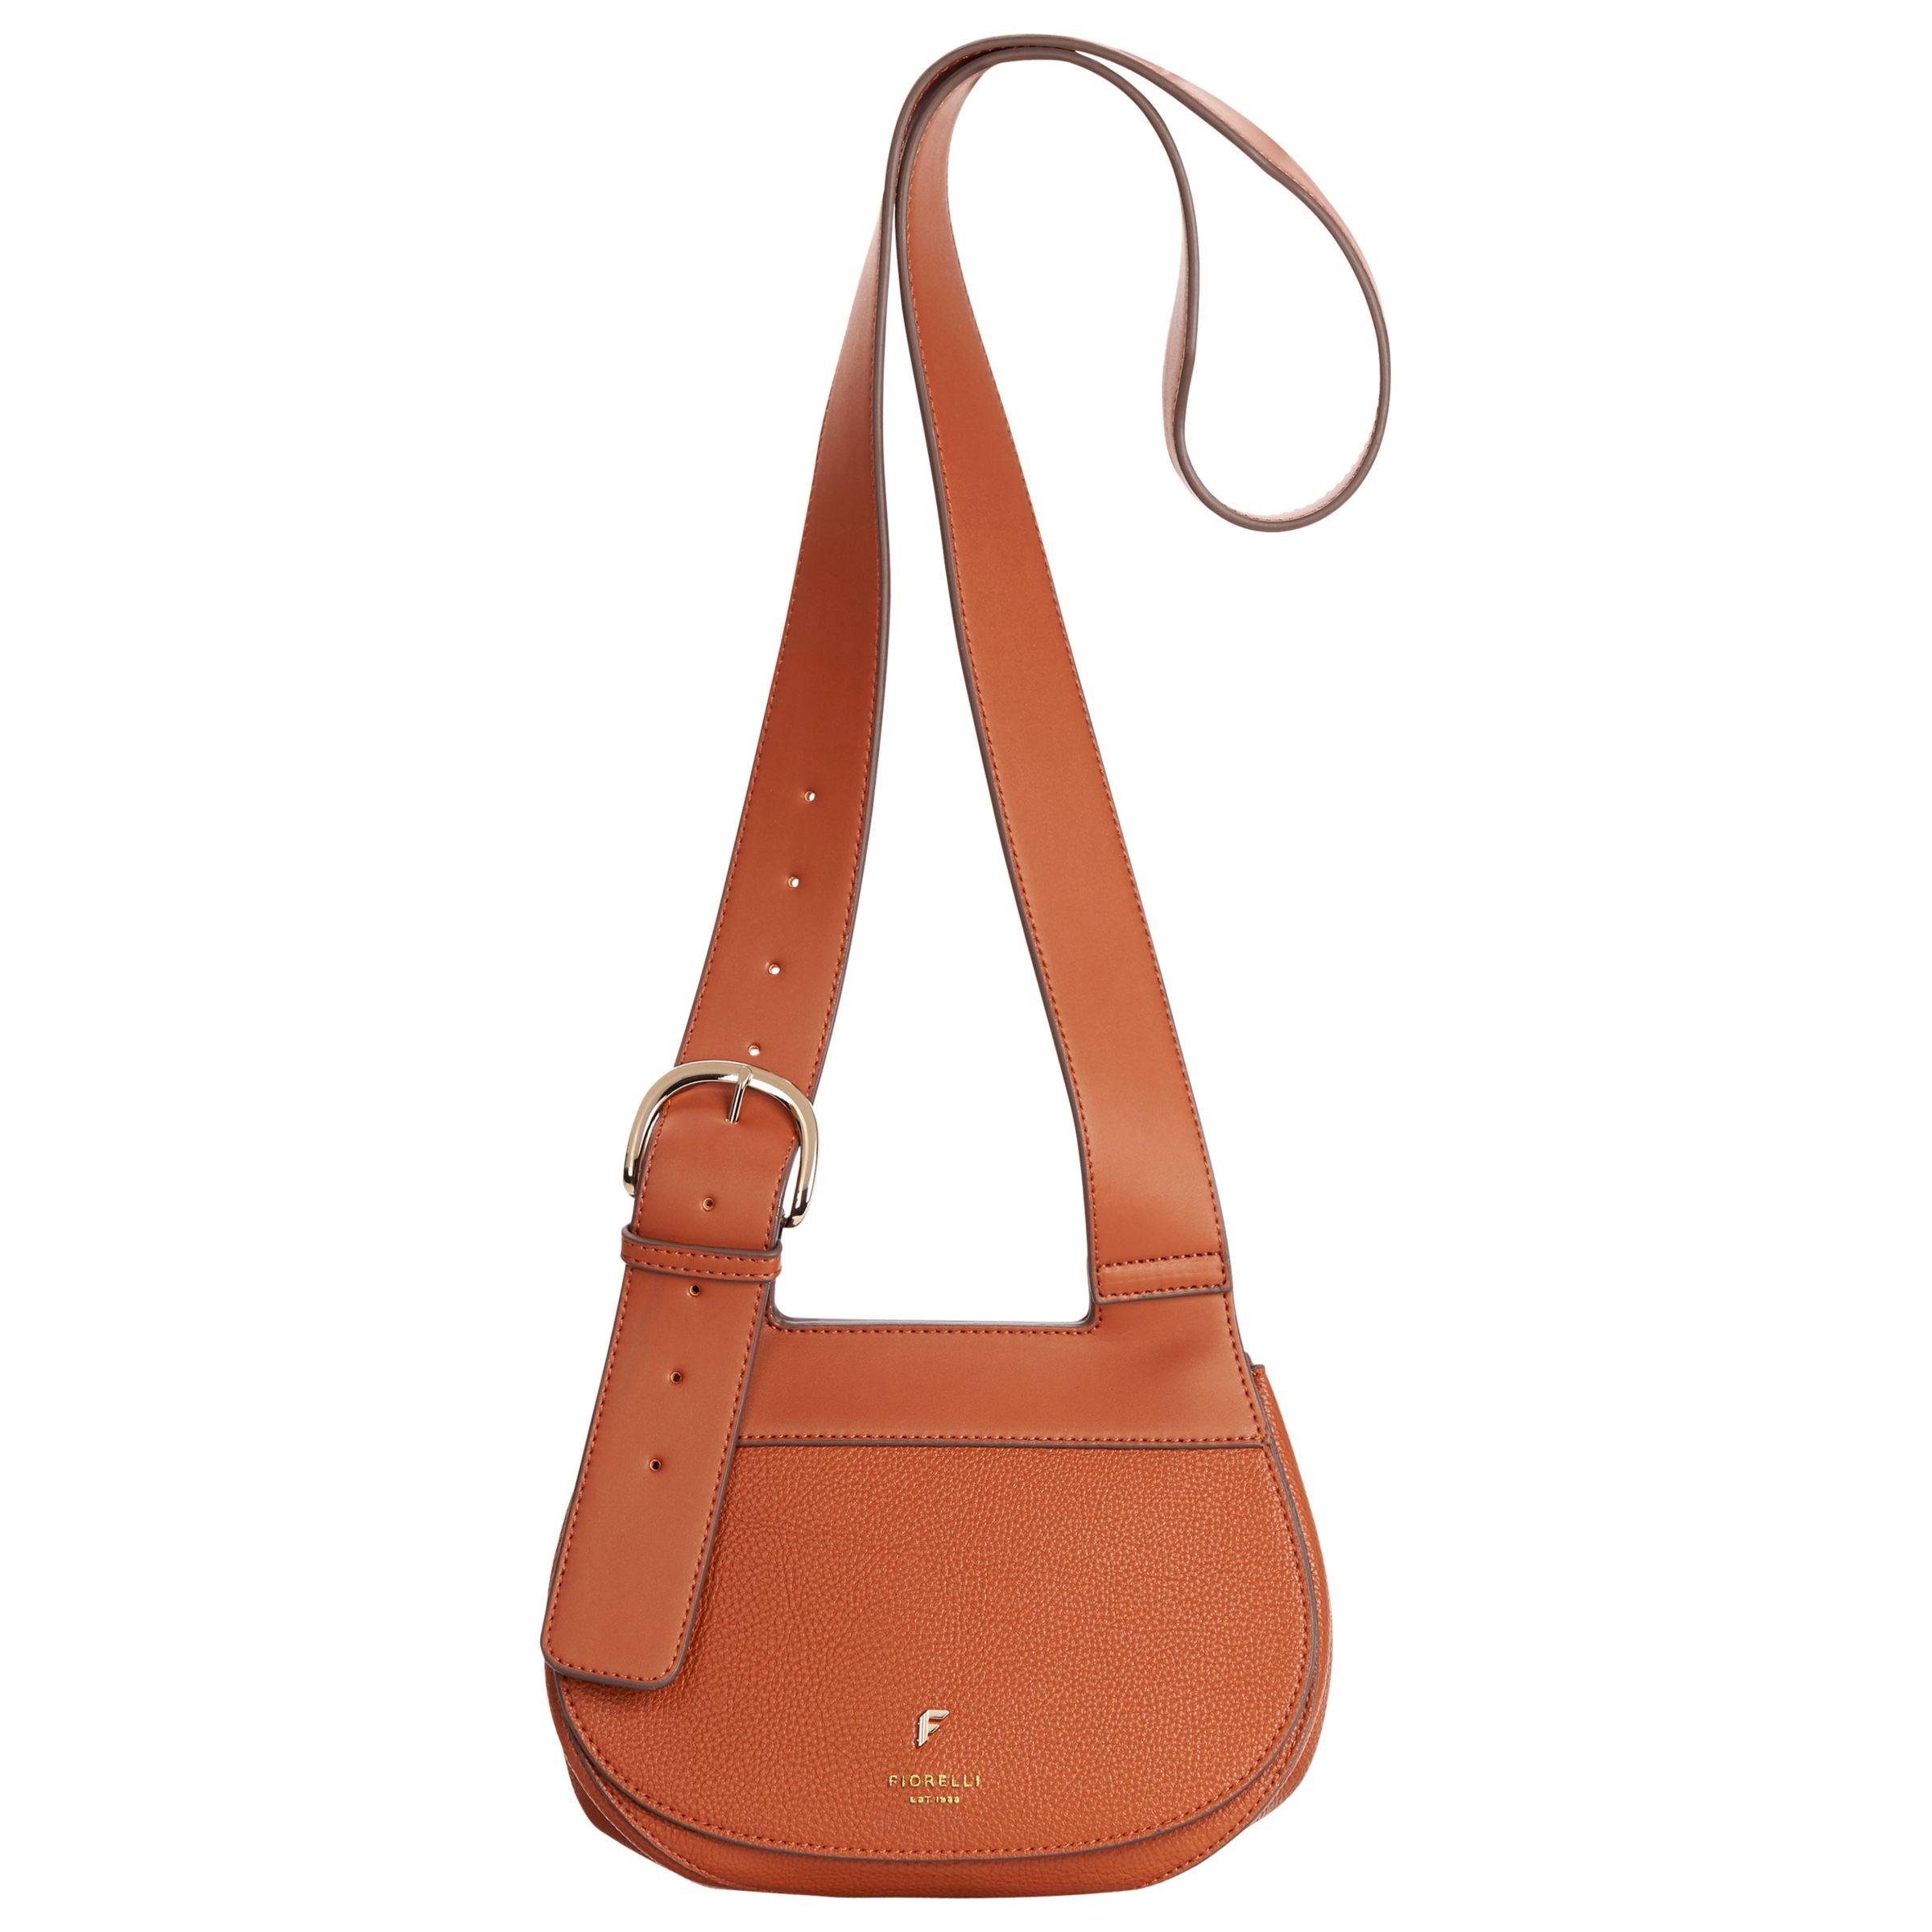 Fiorelli Fiorelli Georgia Saddle Across Body Bag